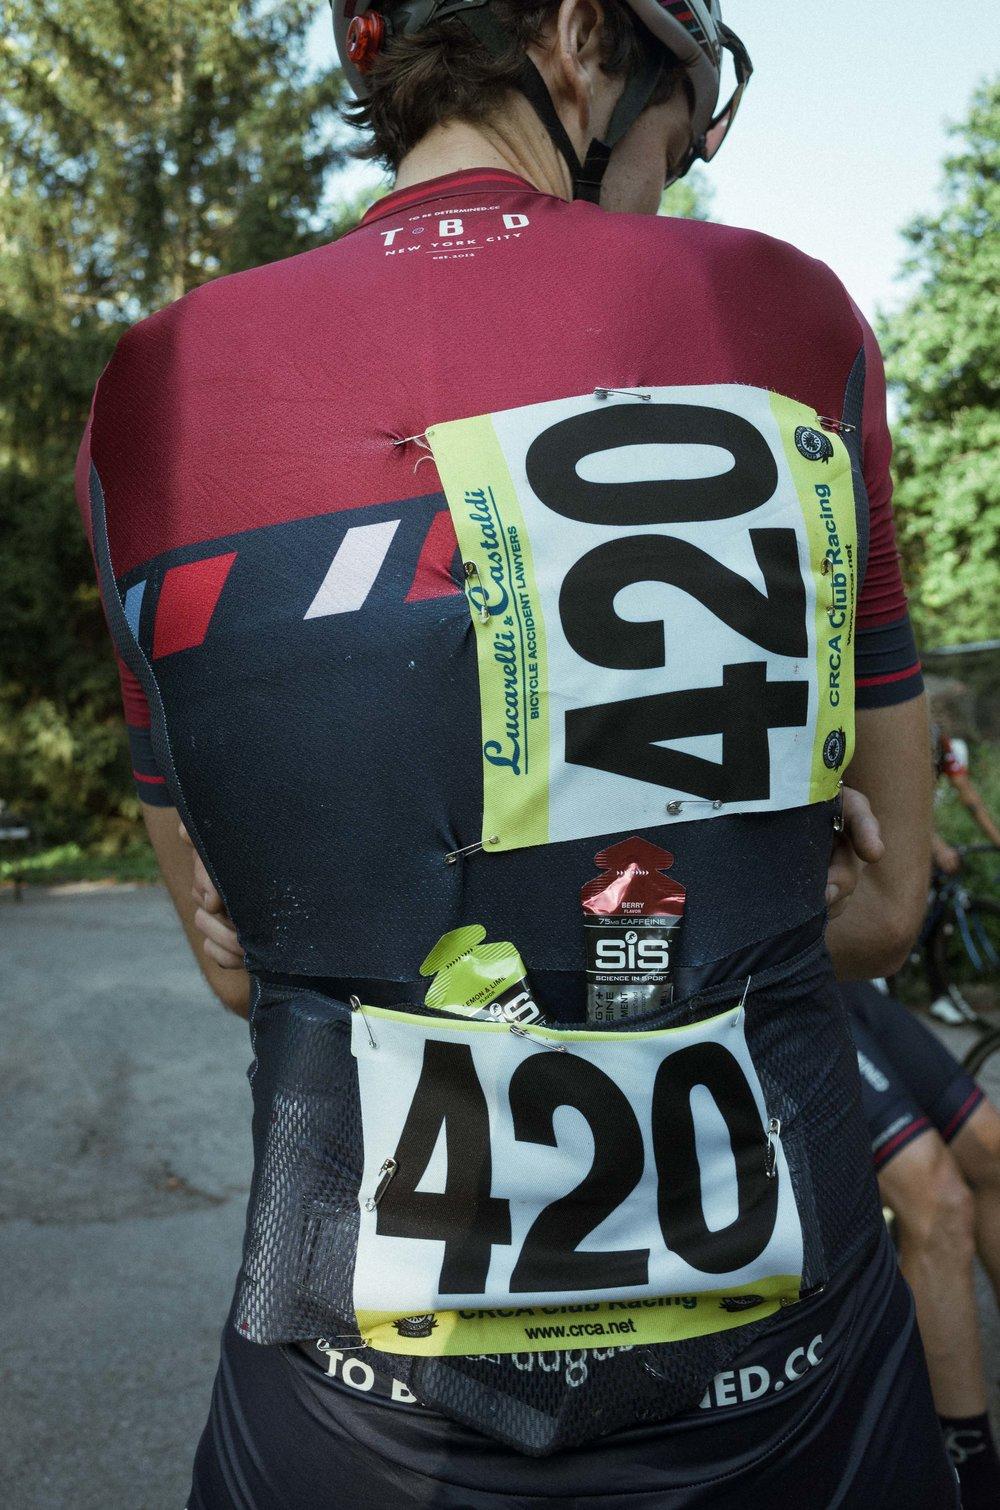 photo-rhetoric-to-be-determined-crca-club-race-125.jpg